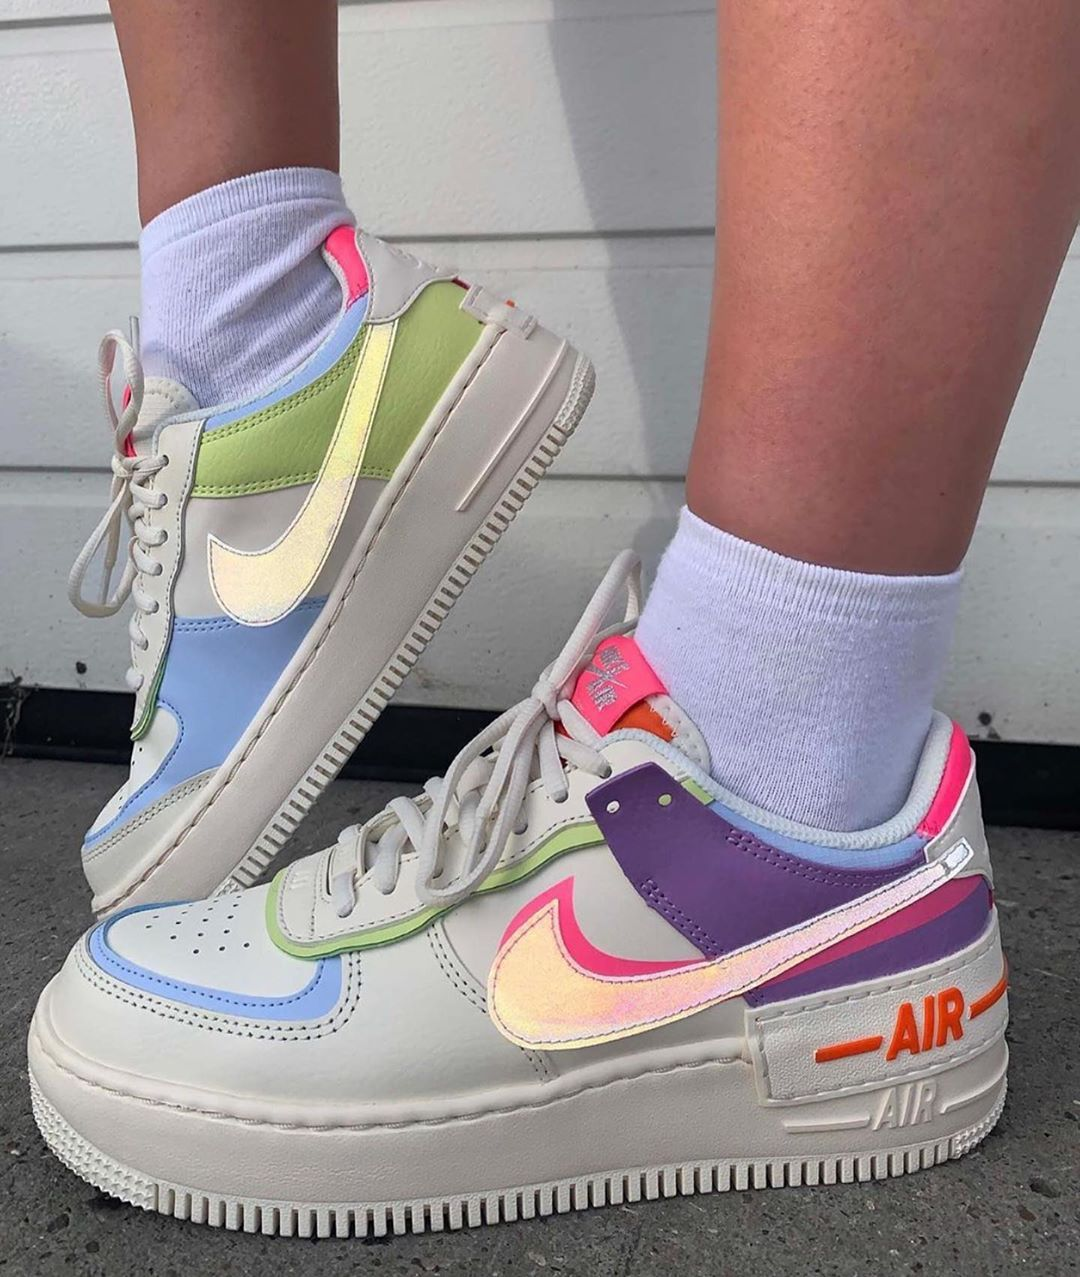 agudo cero Recepción  🥳 Nike Air Force One SHADOW 🤯😍 por tan sólo 59.95€, te gustan? A  nosotros nos encanta… | Zapatillas nike para niñas, Zapatos nike mujer,  Zapatos tenis para mujer